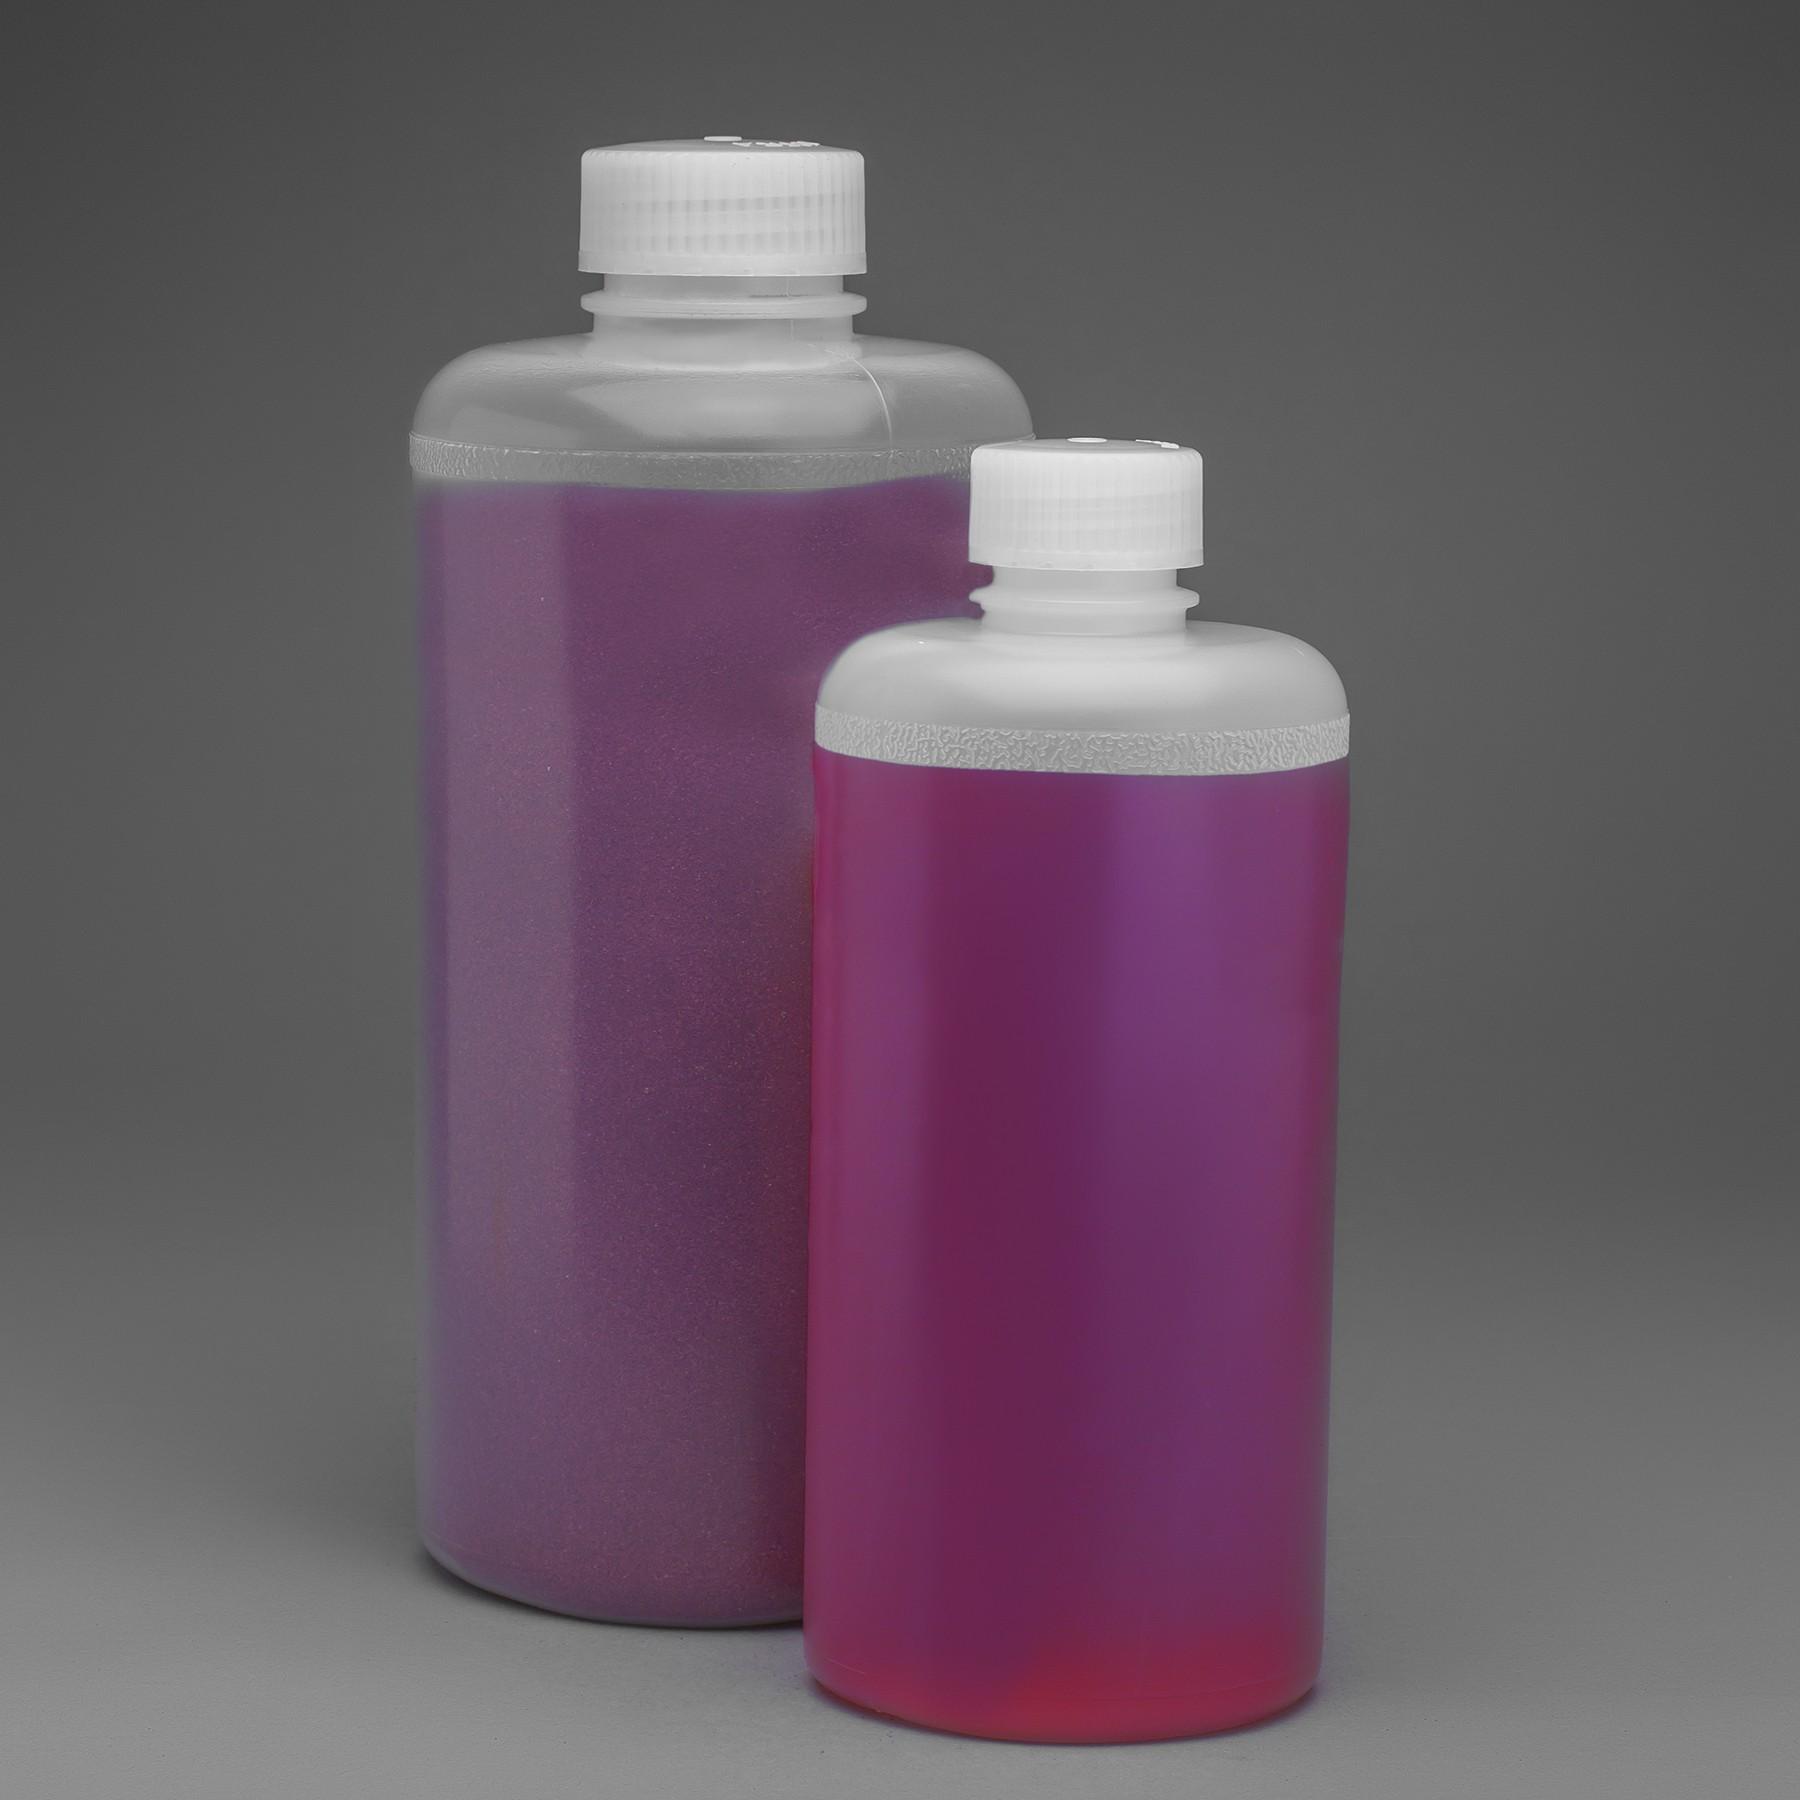 Precisionware Narrow-Mouth Bottles – Autoclavable Polypropylene